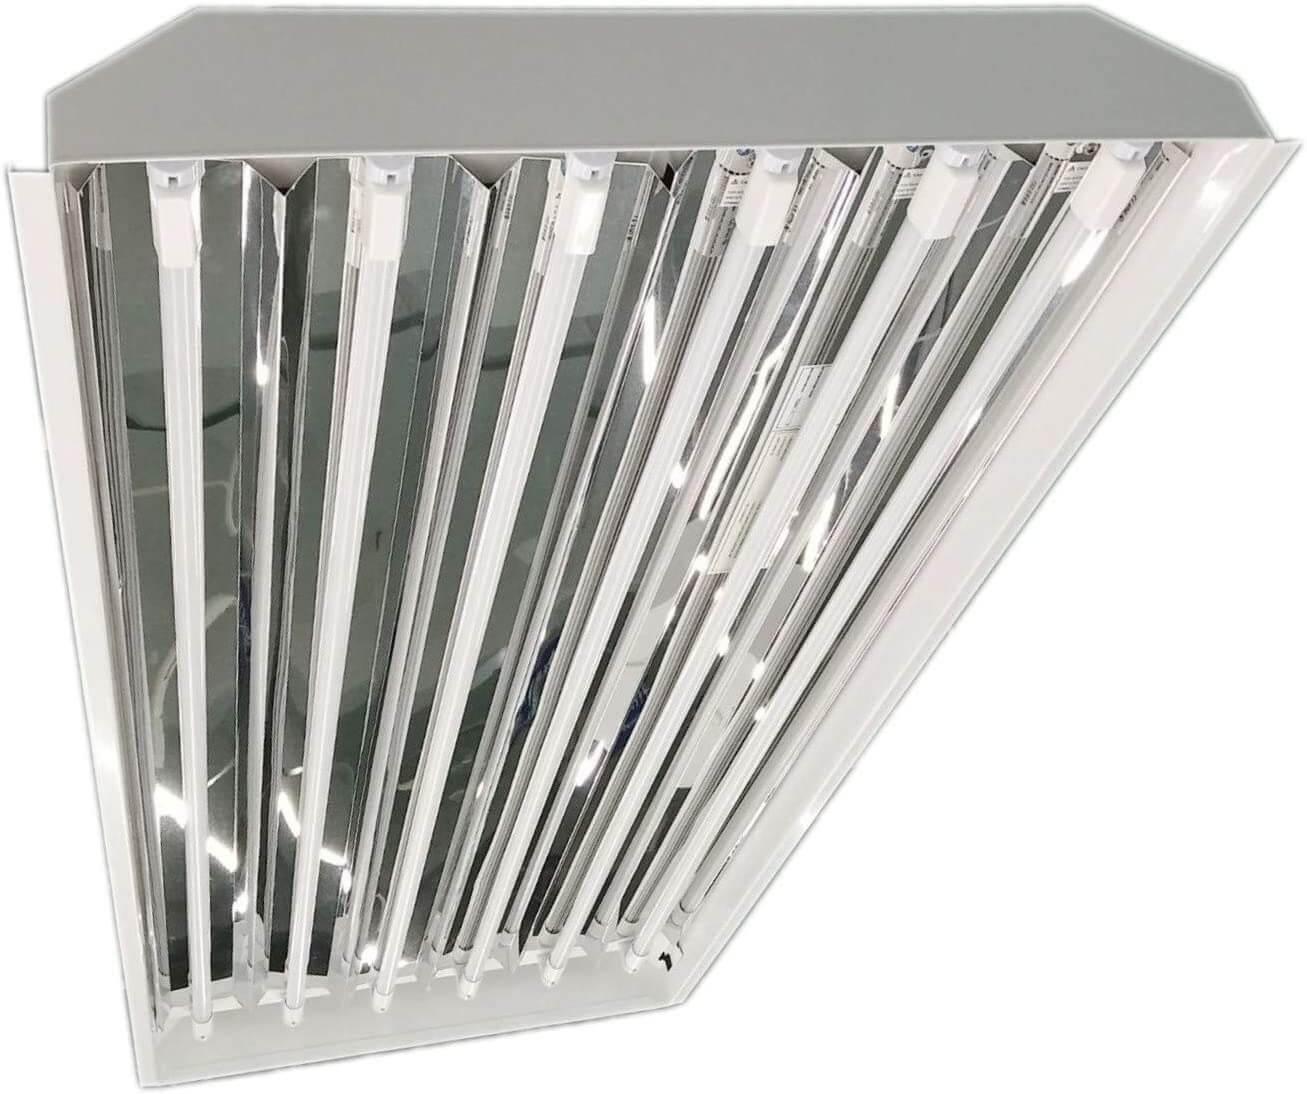 T5 LED Bulb in High Ceiling Luminaire